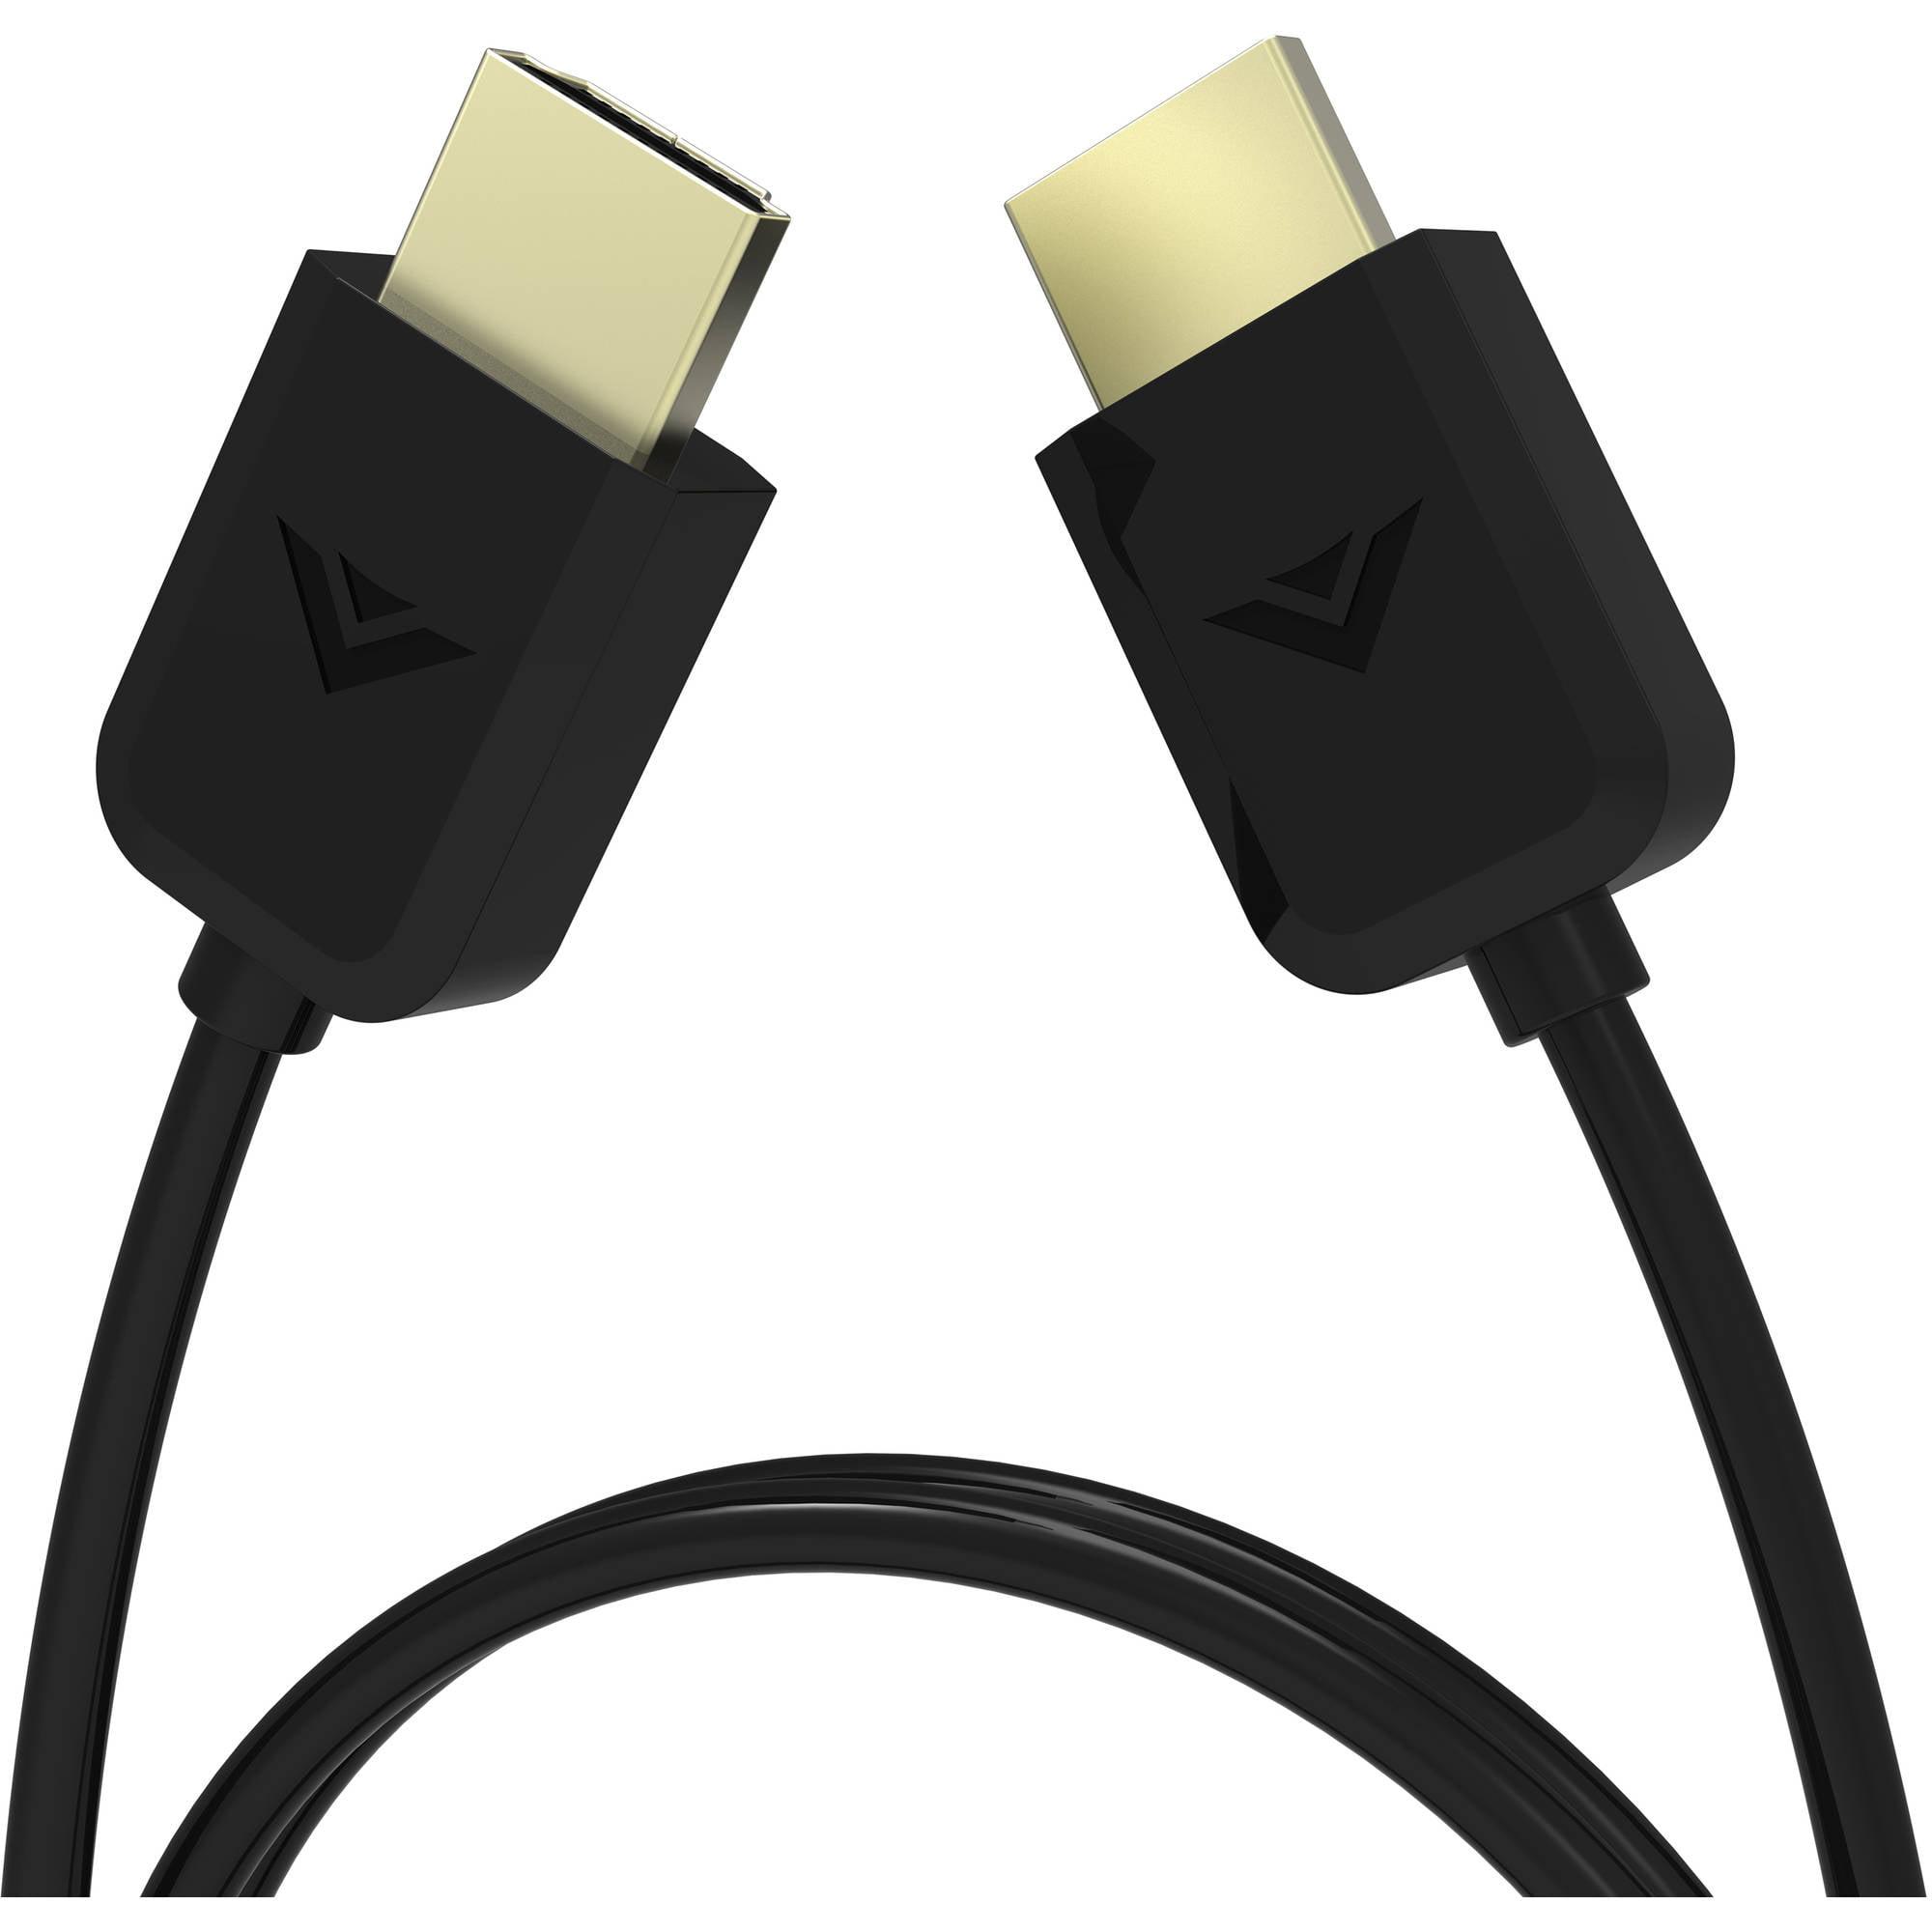 VIZIO Premium High-Speed HDMI Cable, 12\' - Walmart.com